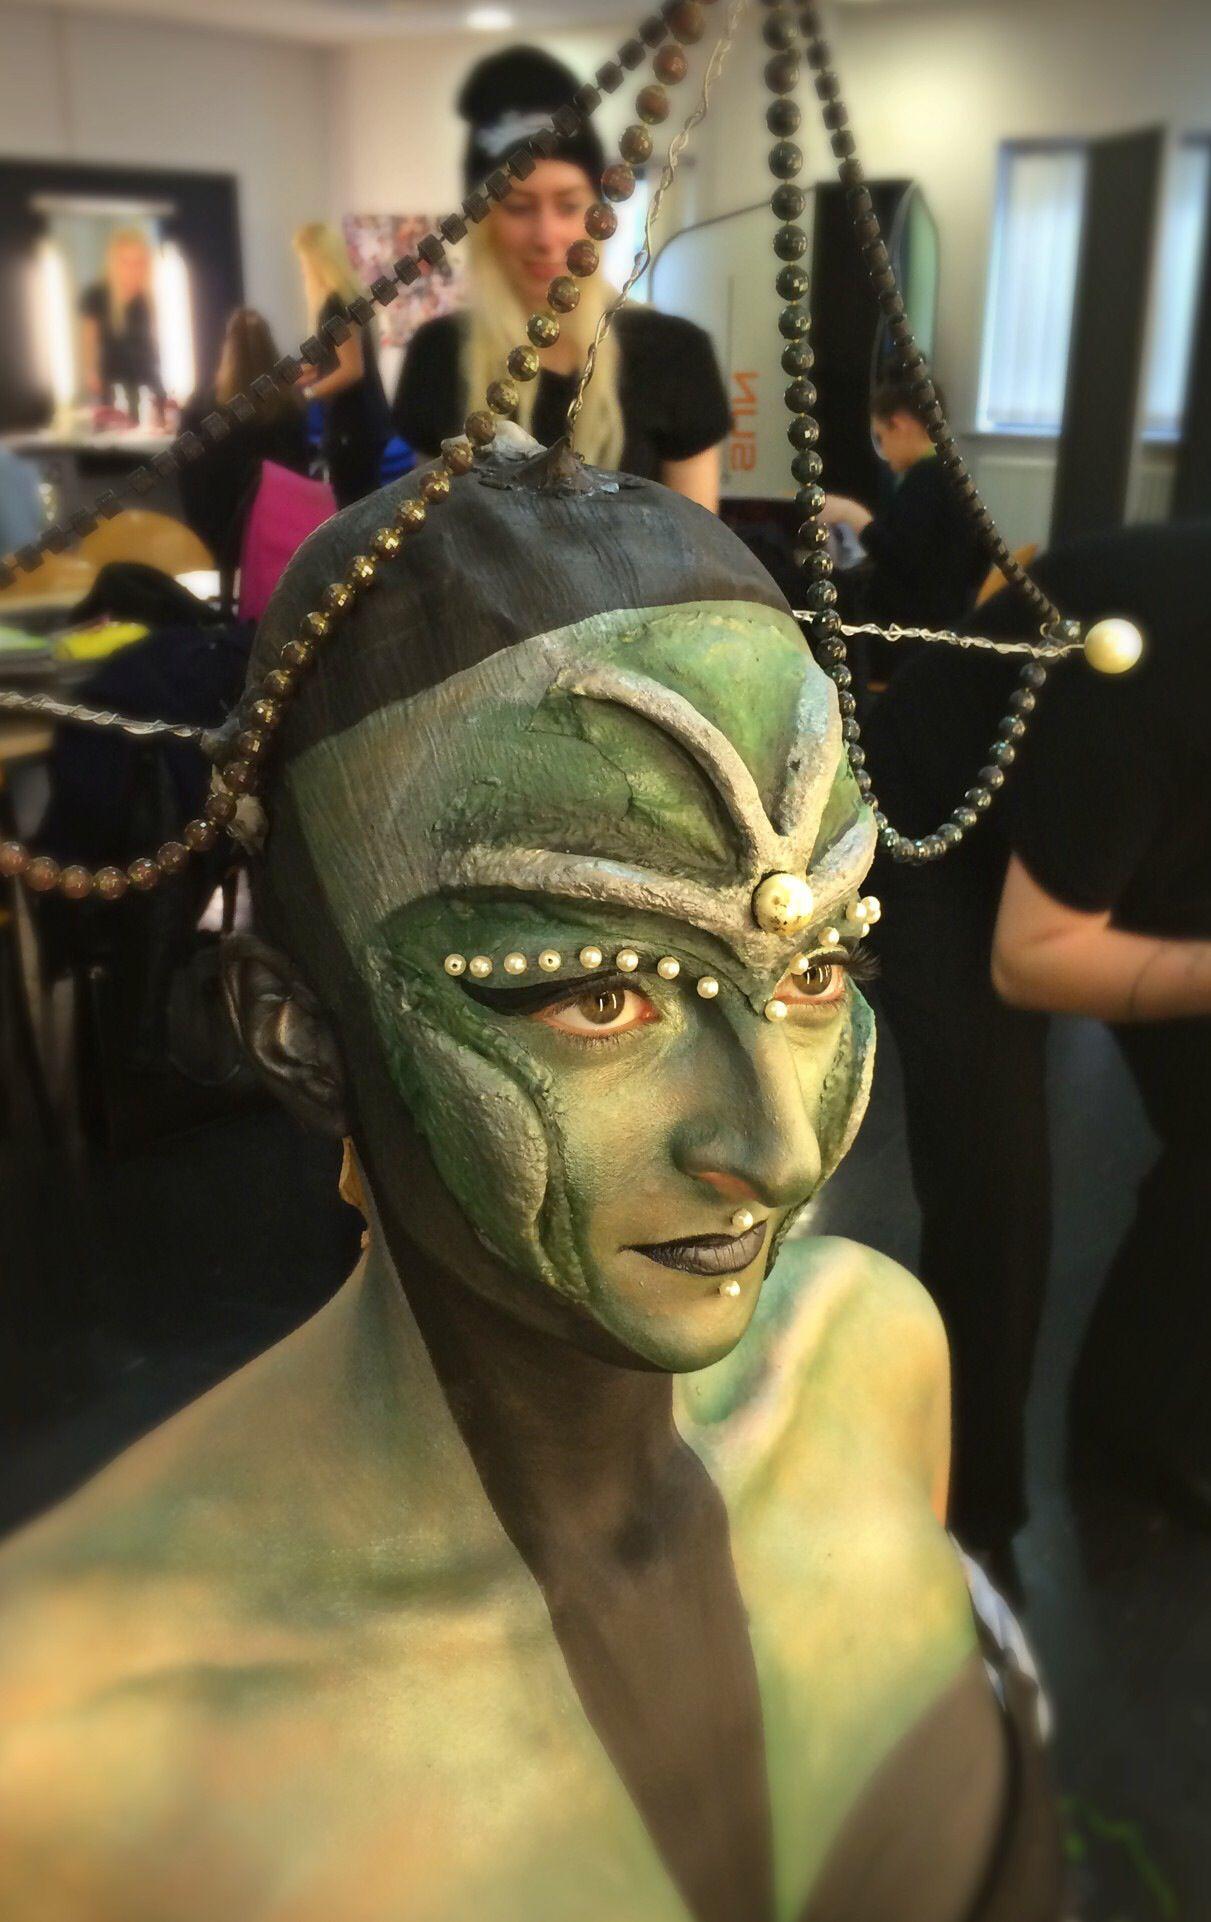 Alien makeup prosthetics by Zoe Butterworth Makeup